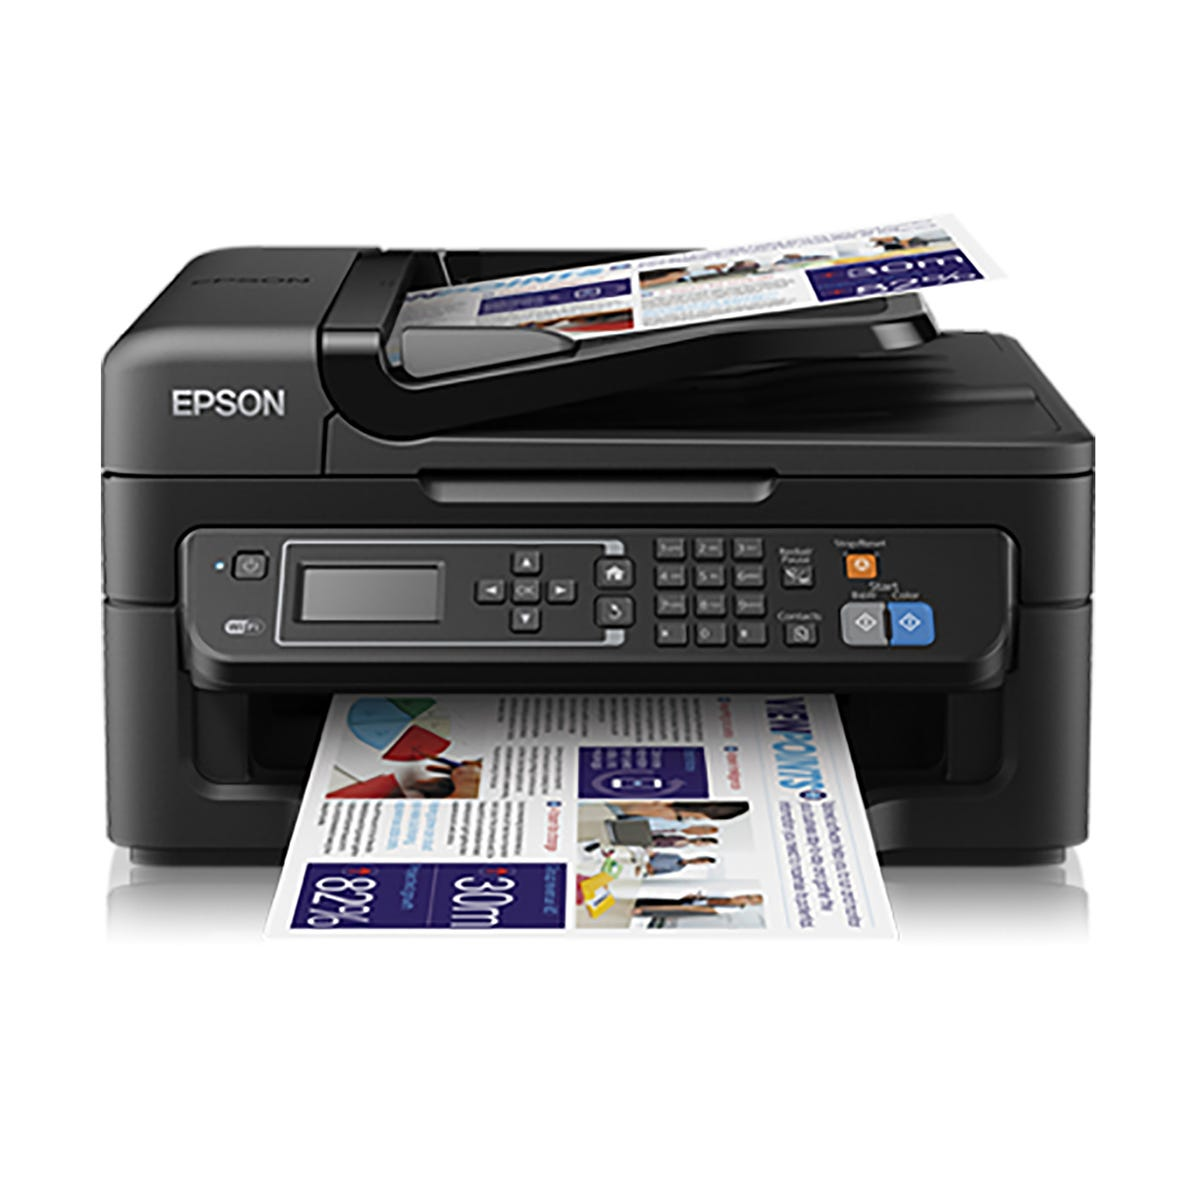 Epson workforce WF-2630WF 4 in 1 Printer